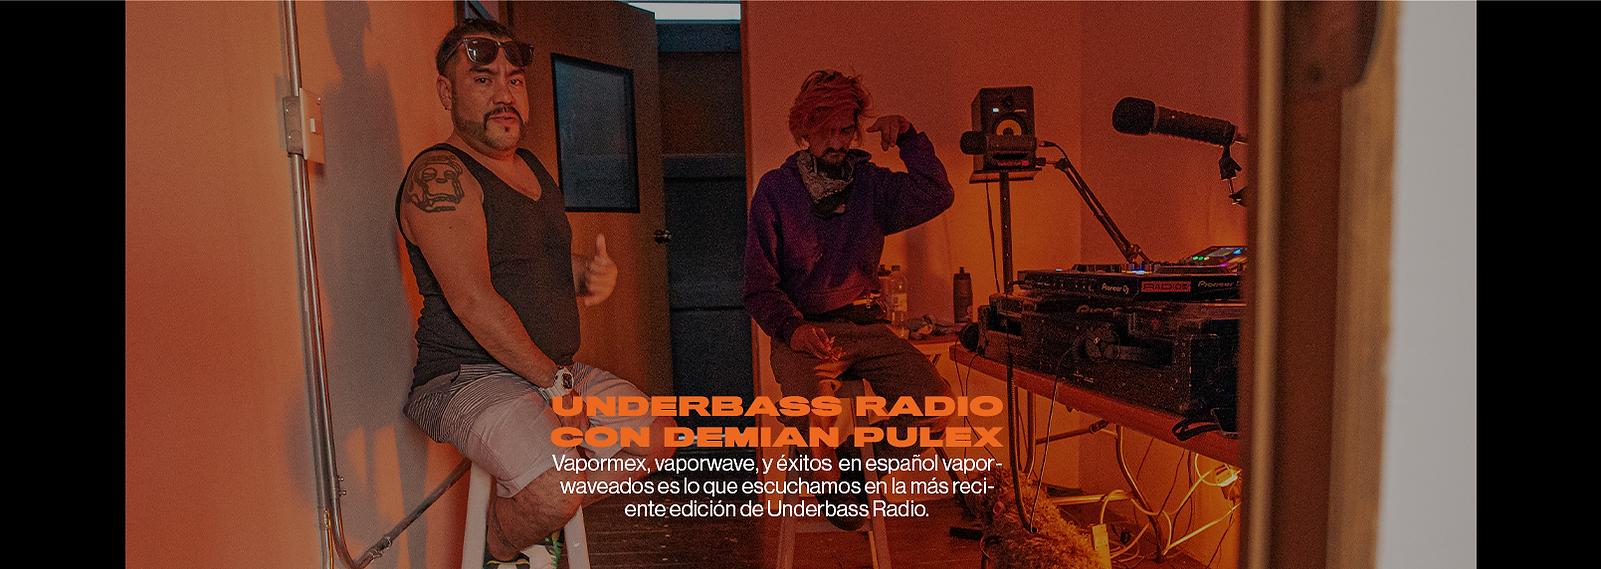 Underbass_Radio_c_Demian_Pulex.png